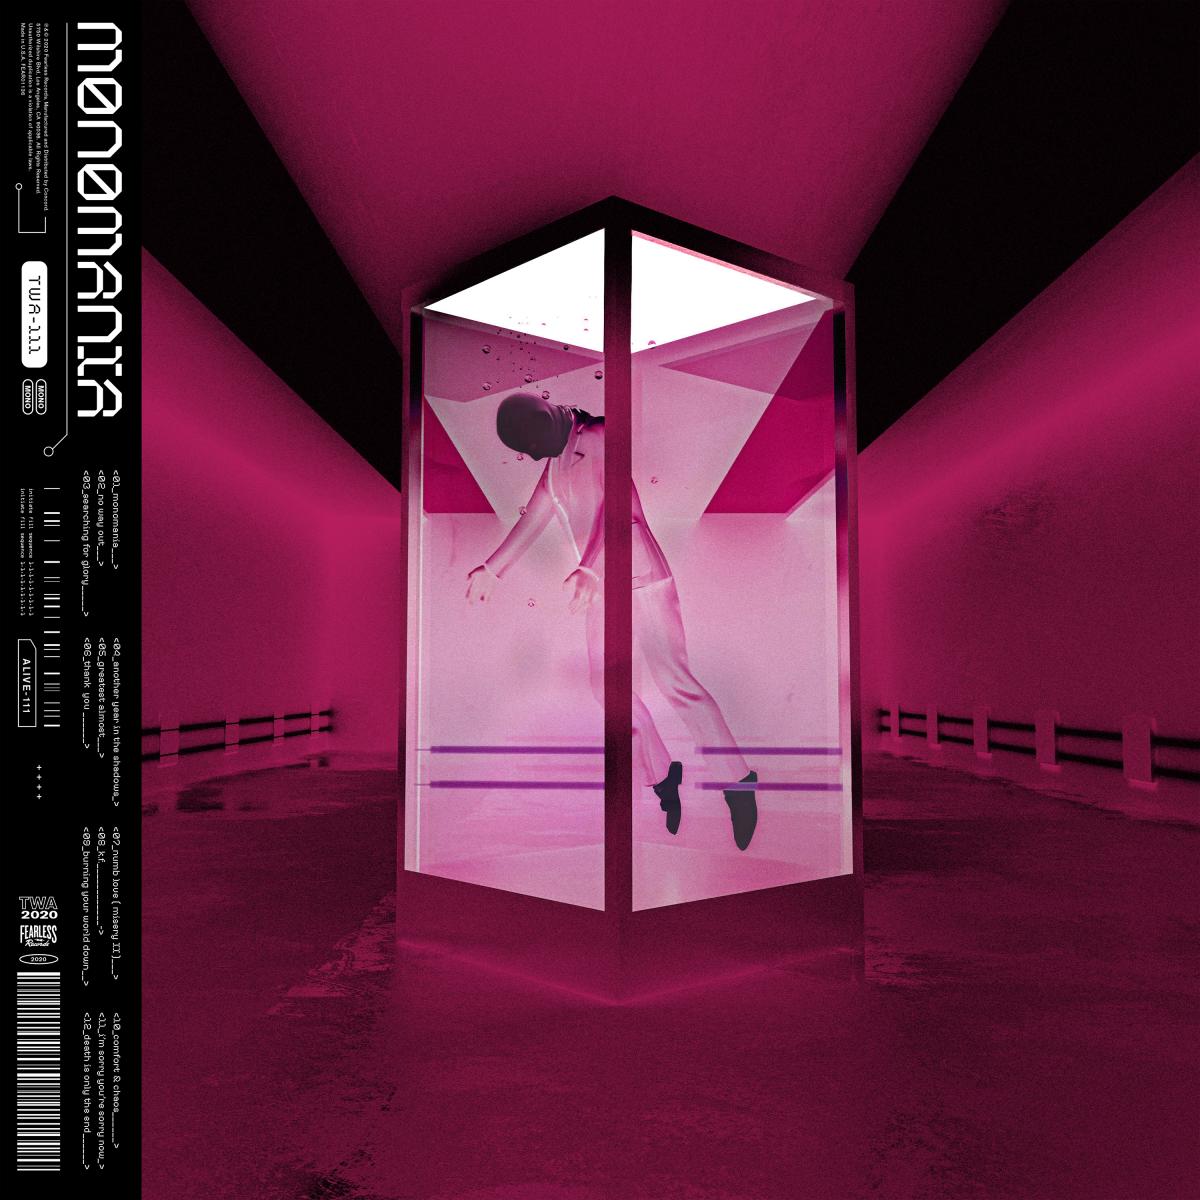 the-word-alive-monomania-alt-und-neu-album-review